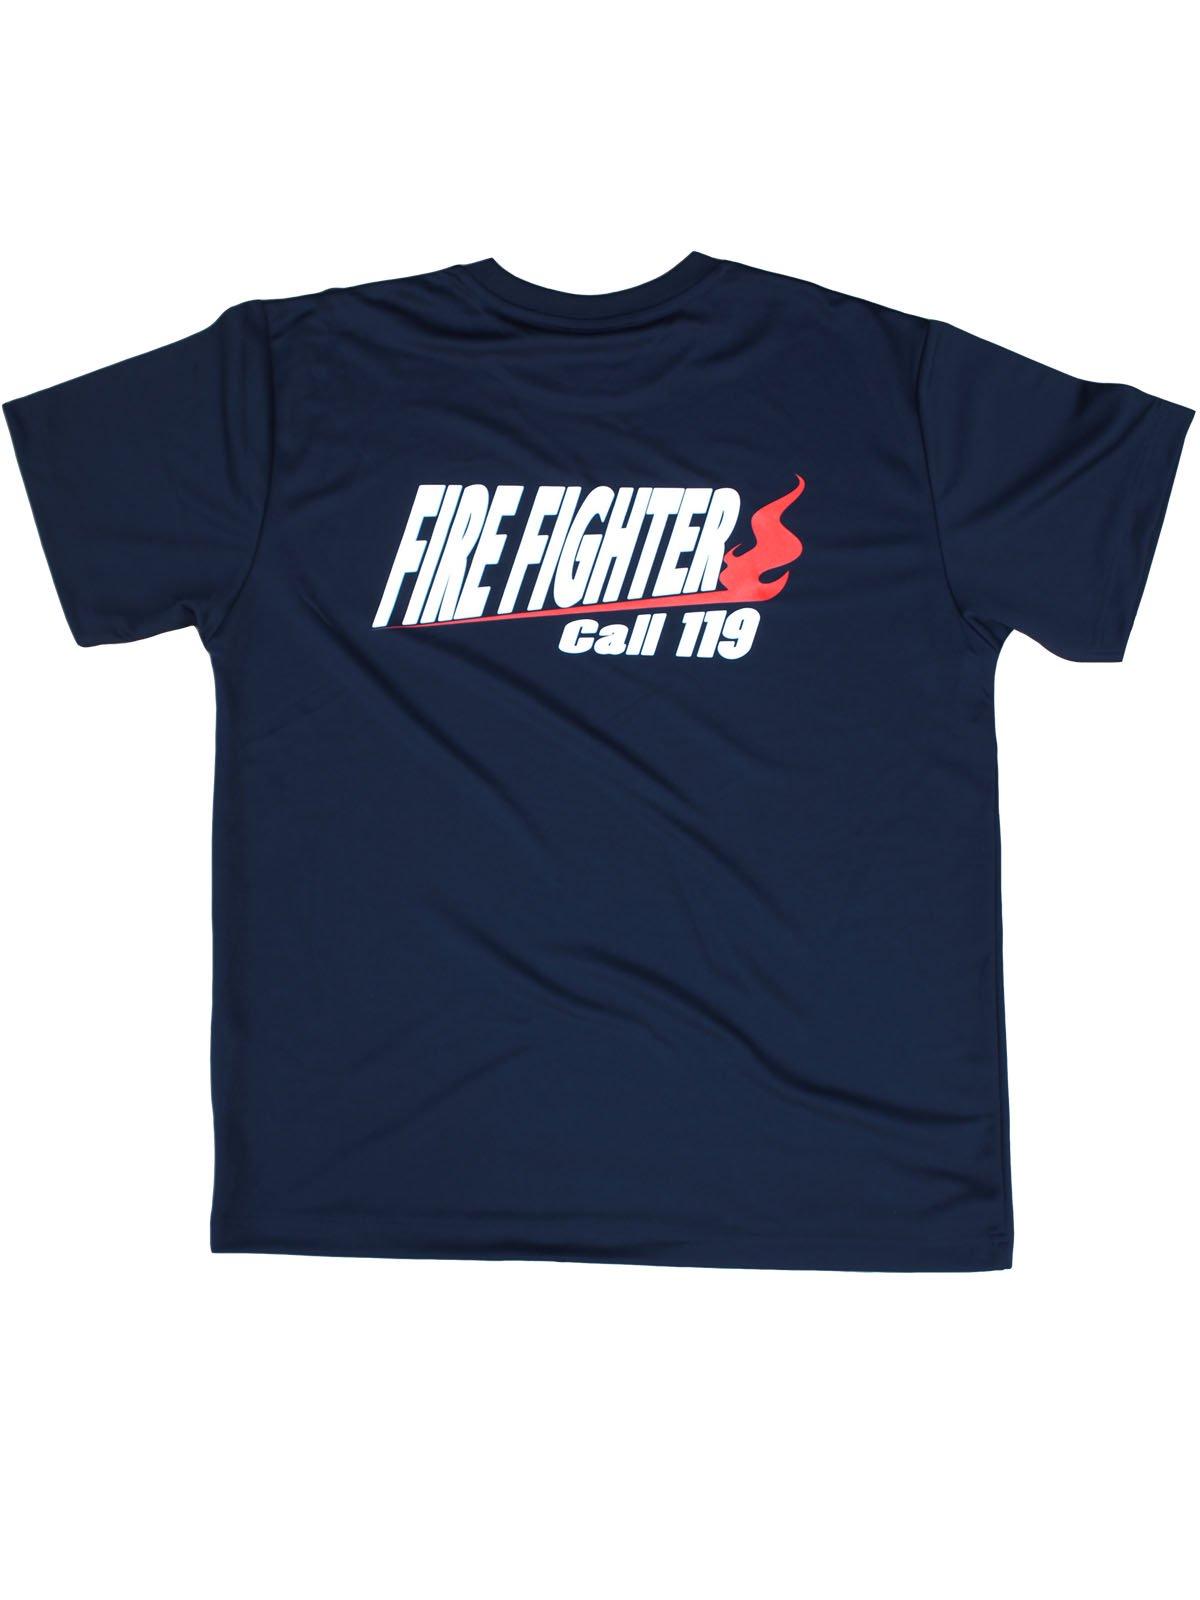 FIRE FIGHTER Call119 デザインTシャツ【画像4】